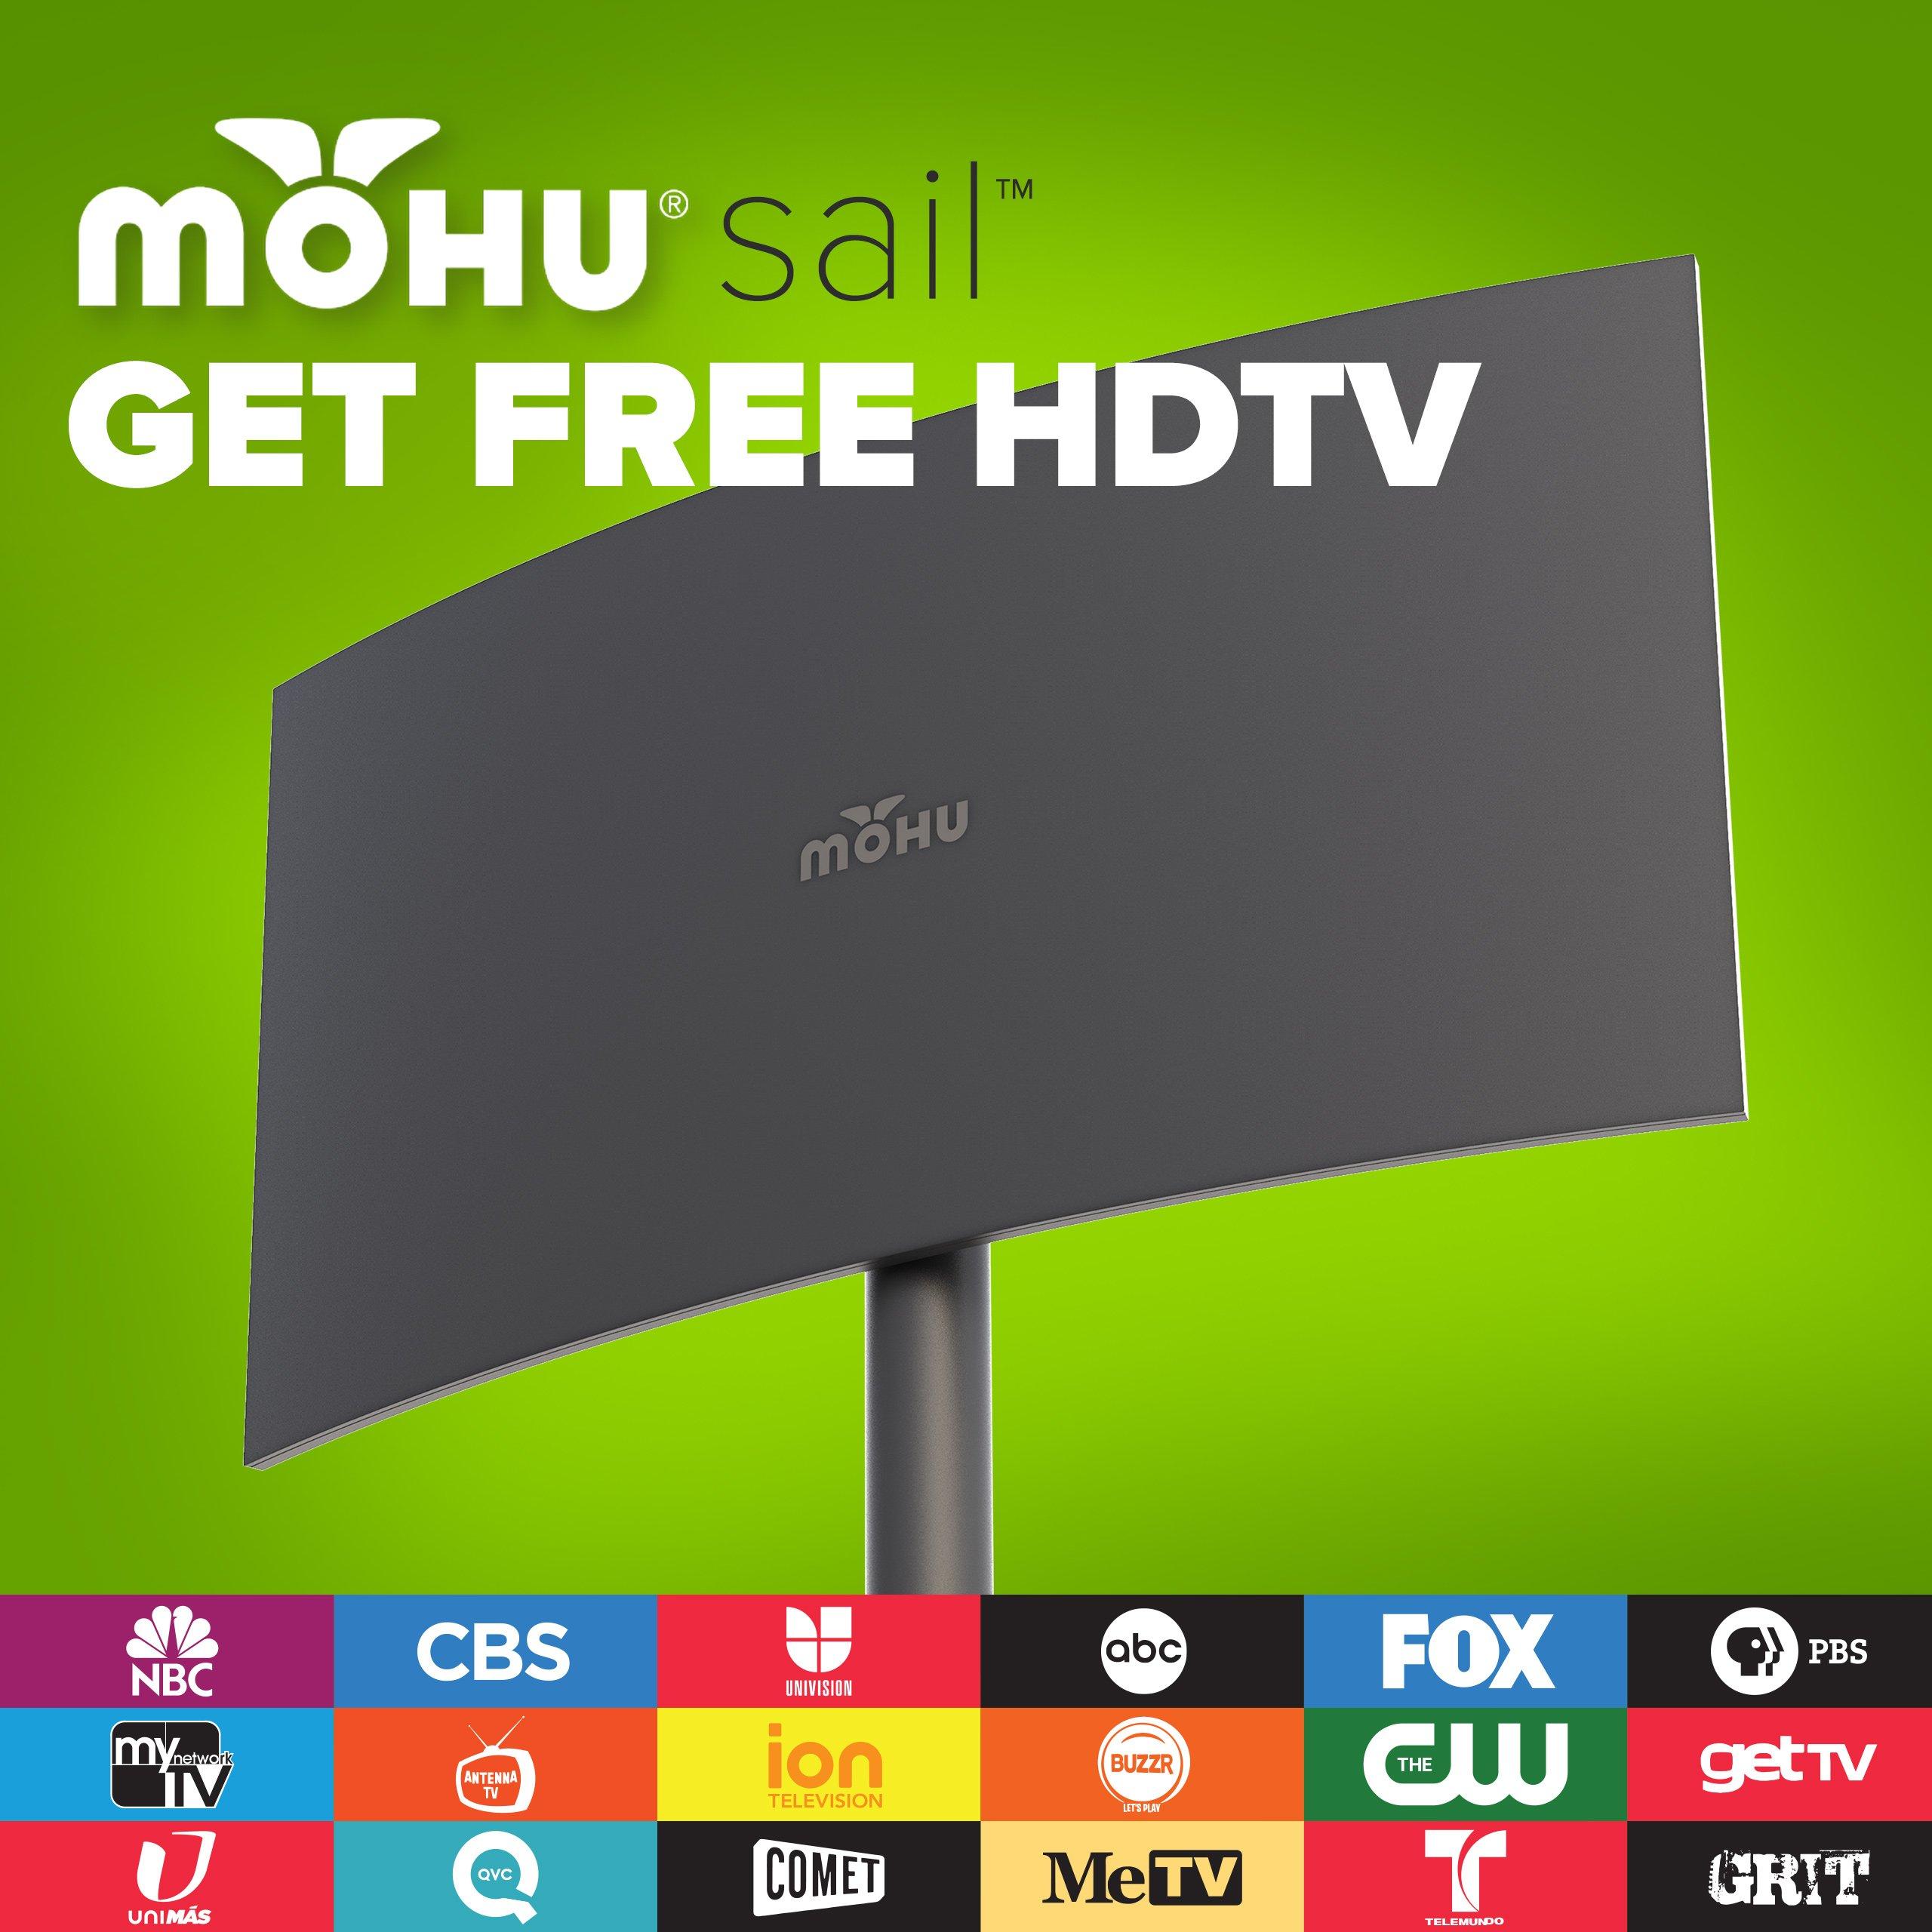 Mohu Sail Outdoor Tv Antenna Multidirectional 75 Mile Range For Free